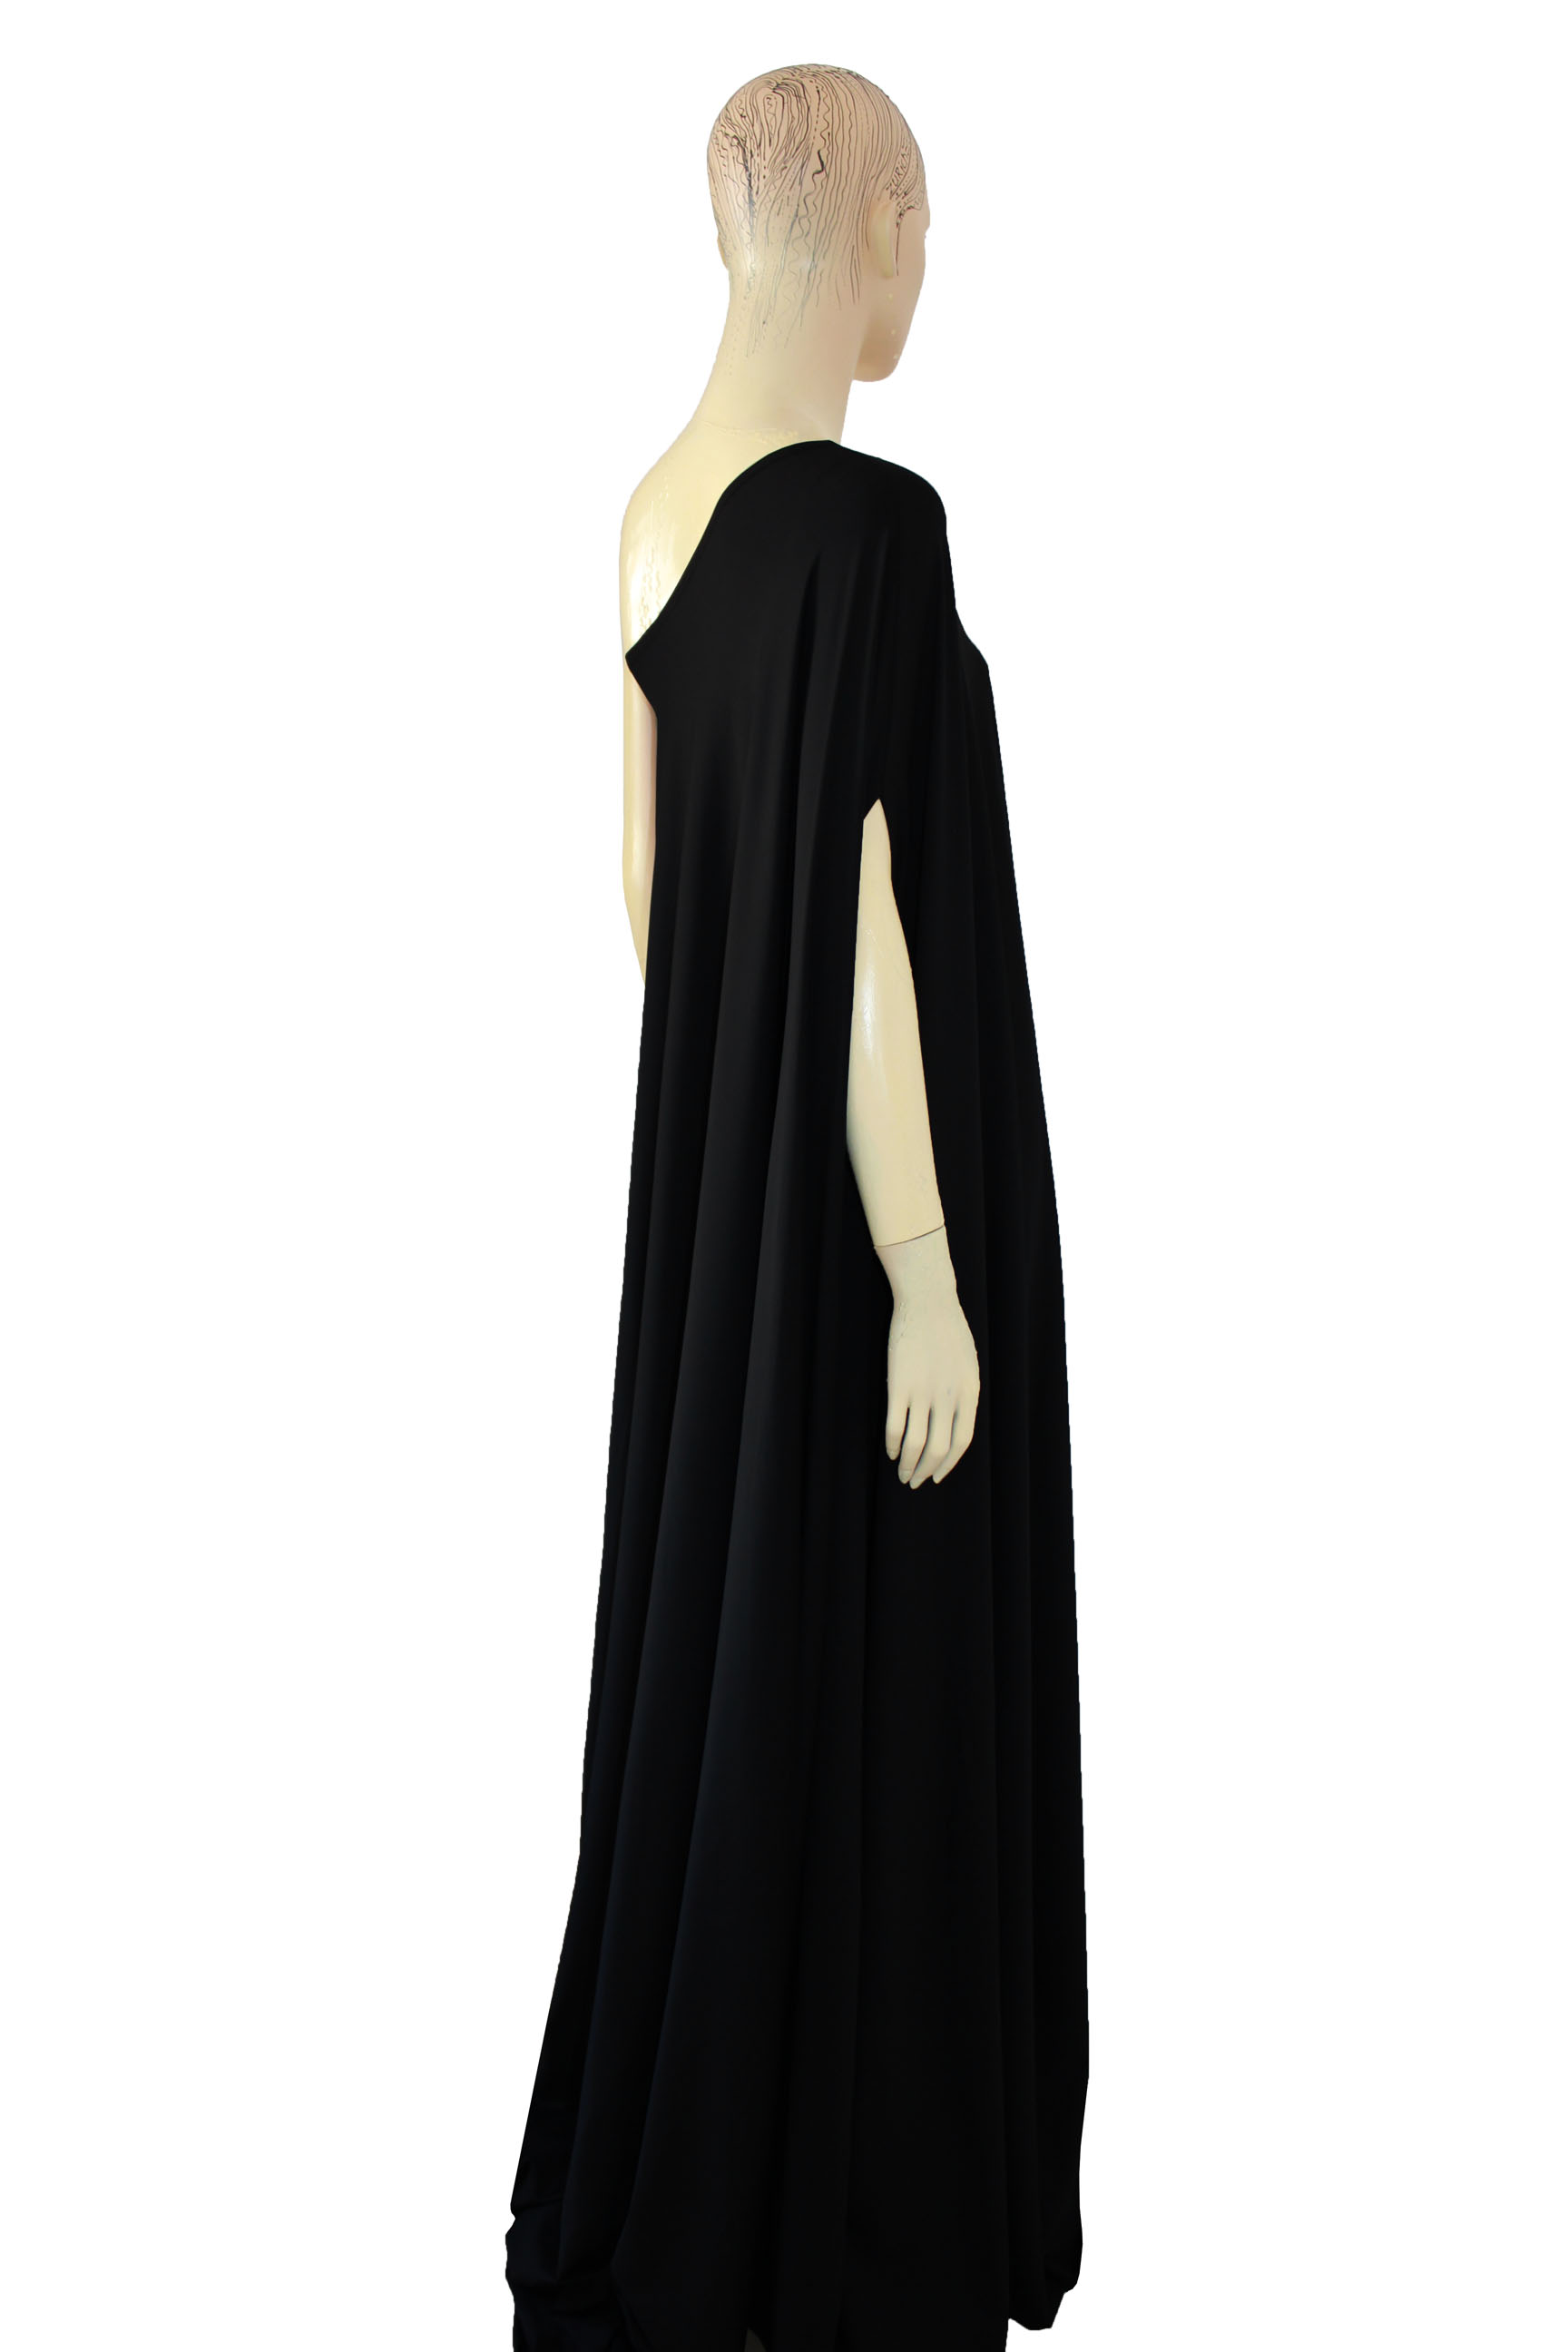 Plus size dress black long formal gown one shoulder maxi dress · EK ...